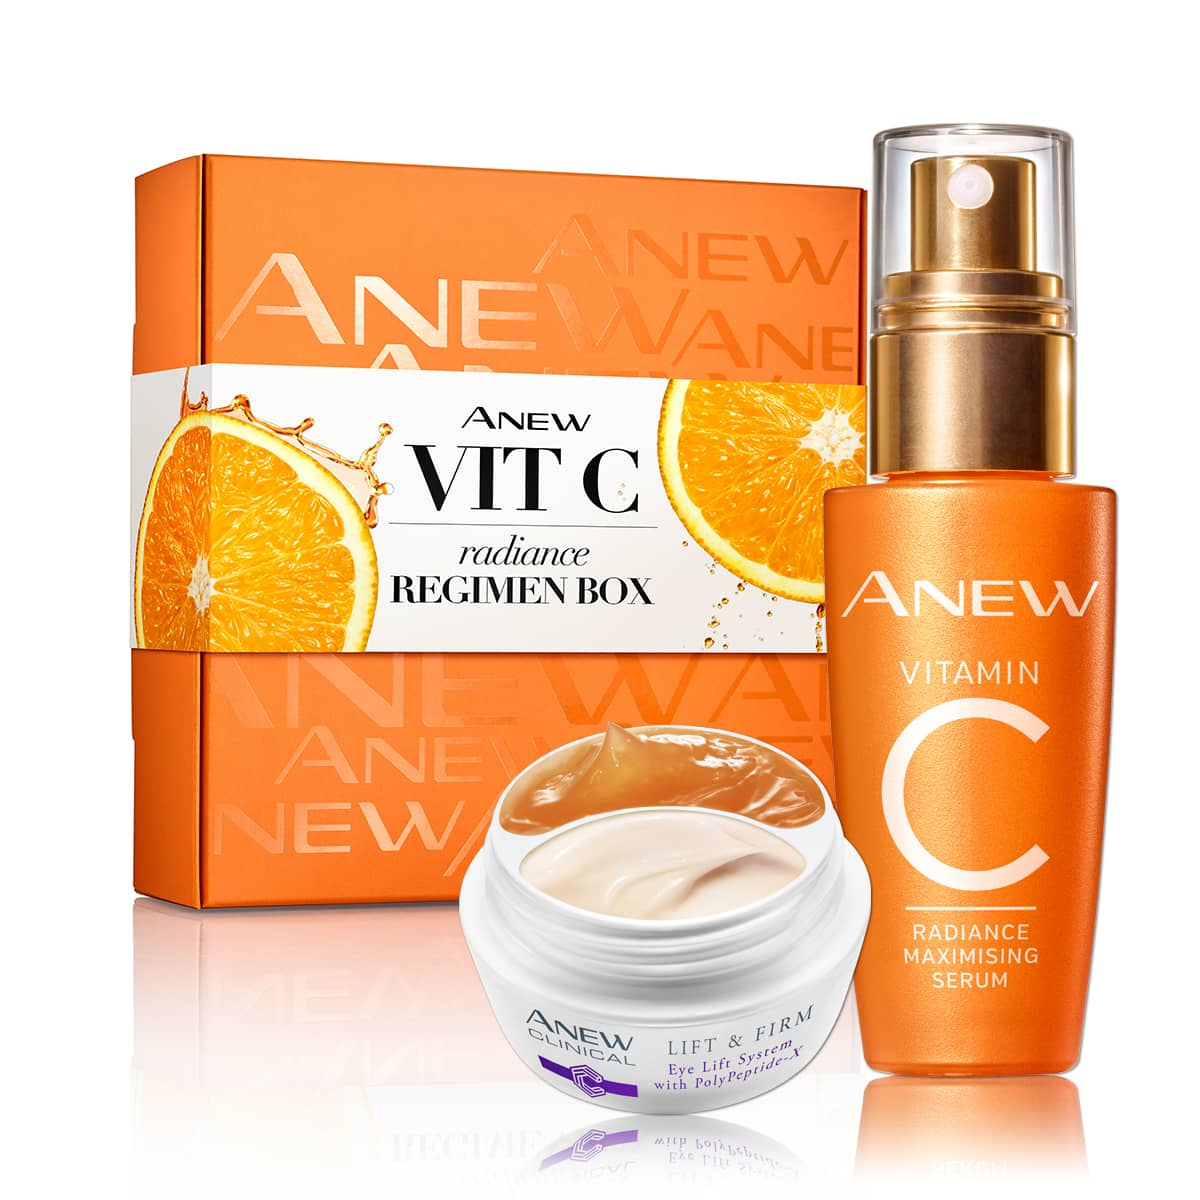 Anew Vitamin C Coffret Cadeau 1323170